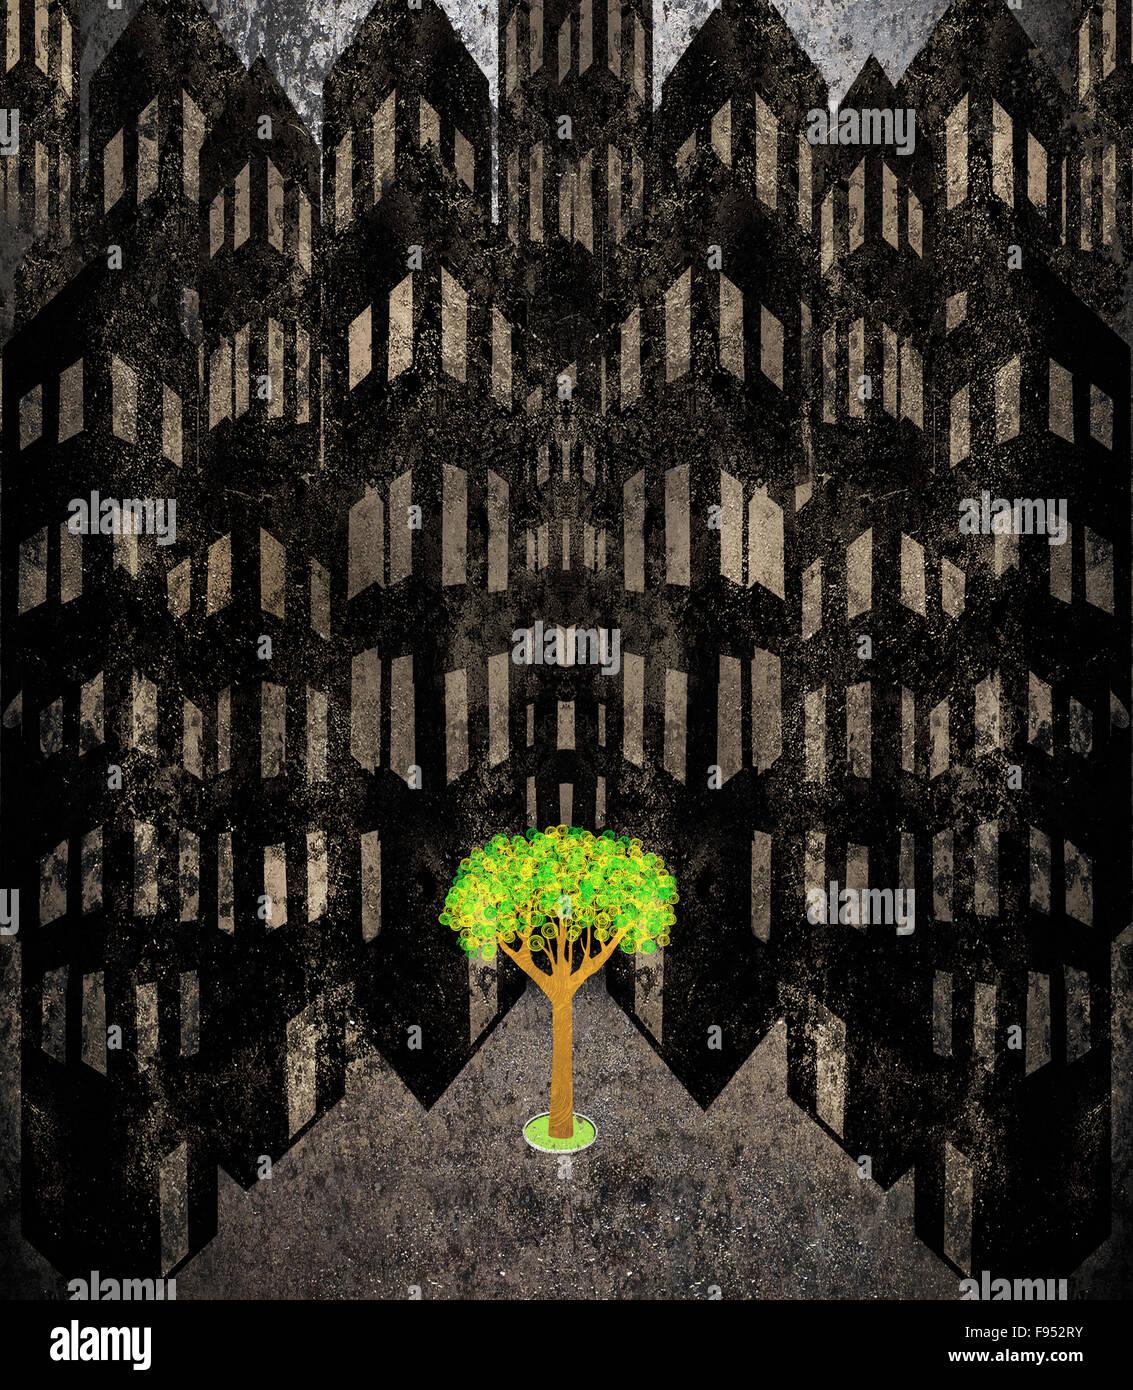 Einsamer Baum in einem stadtbild digitale Illustration Stockbild